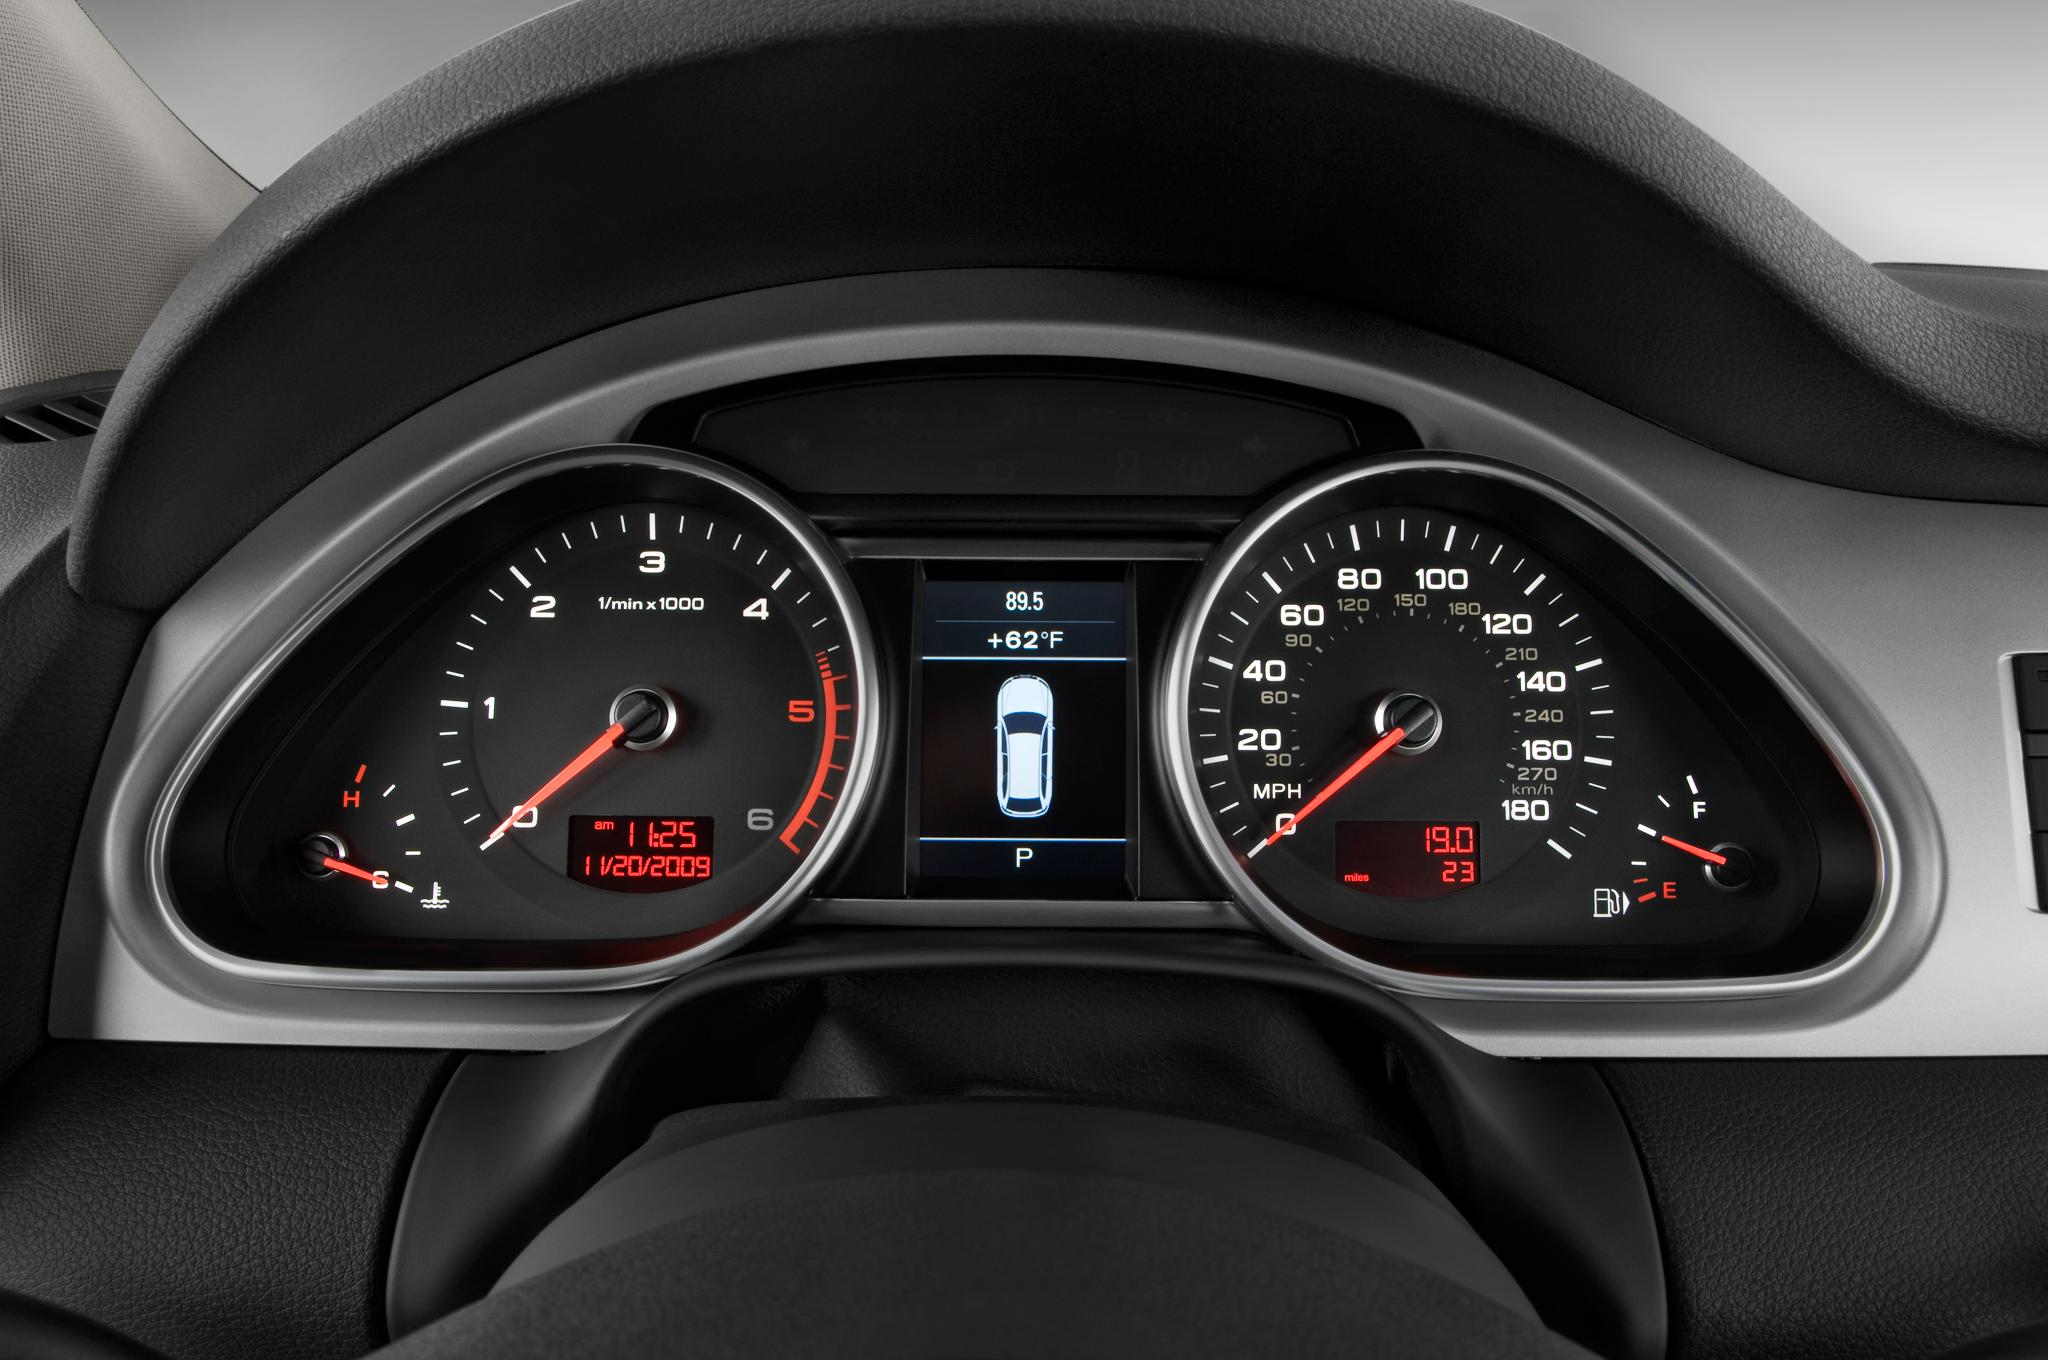 je design tunes up the euro spec audi q7 3 0 tdi gives it a body kit rh automobilemag com 2014 Audi Q5 2012 Audi Q7